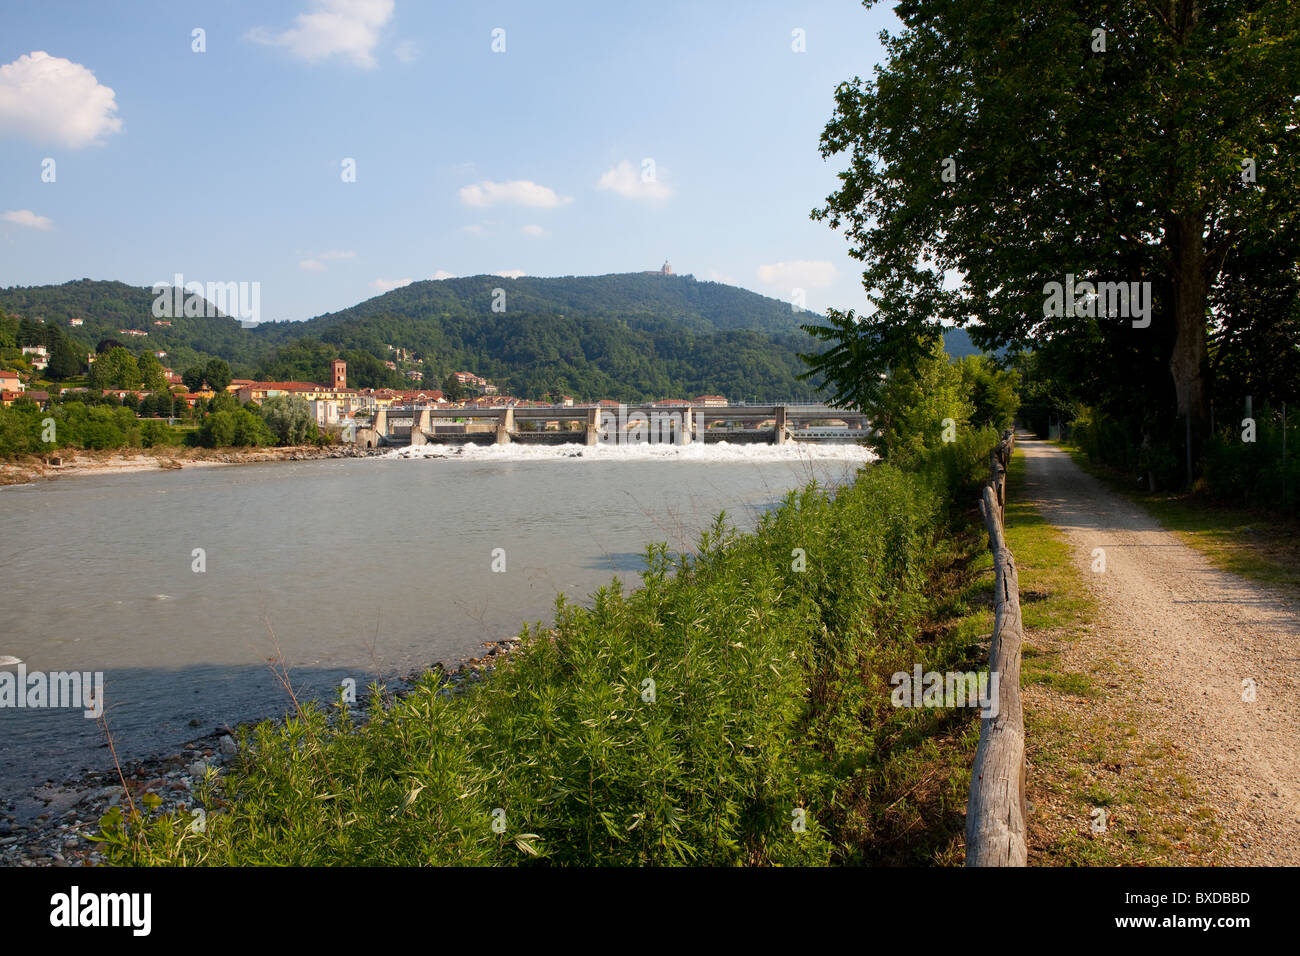 River Bank - Stock Image